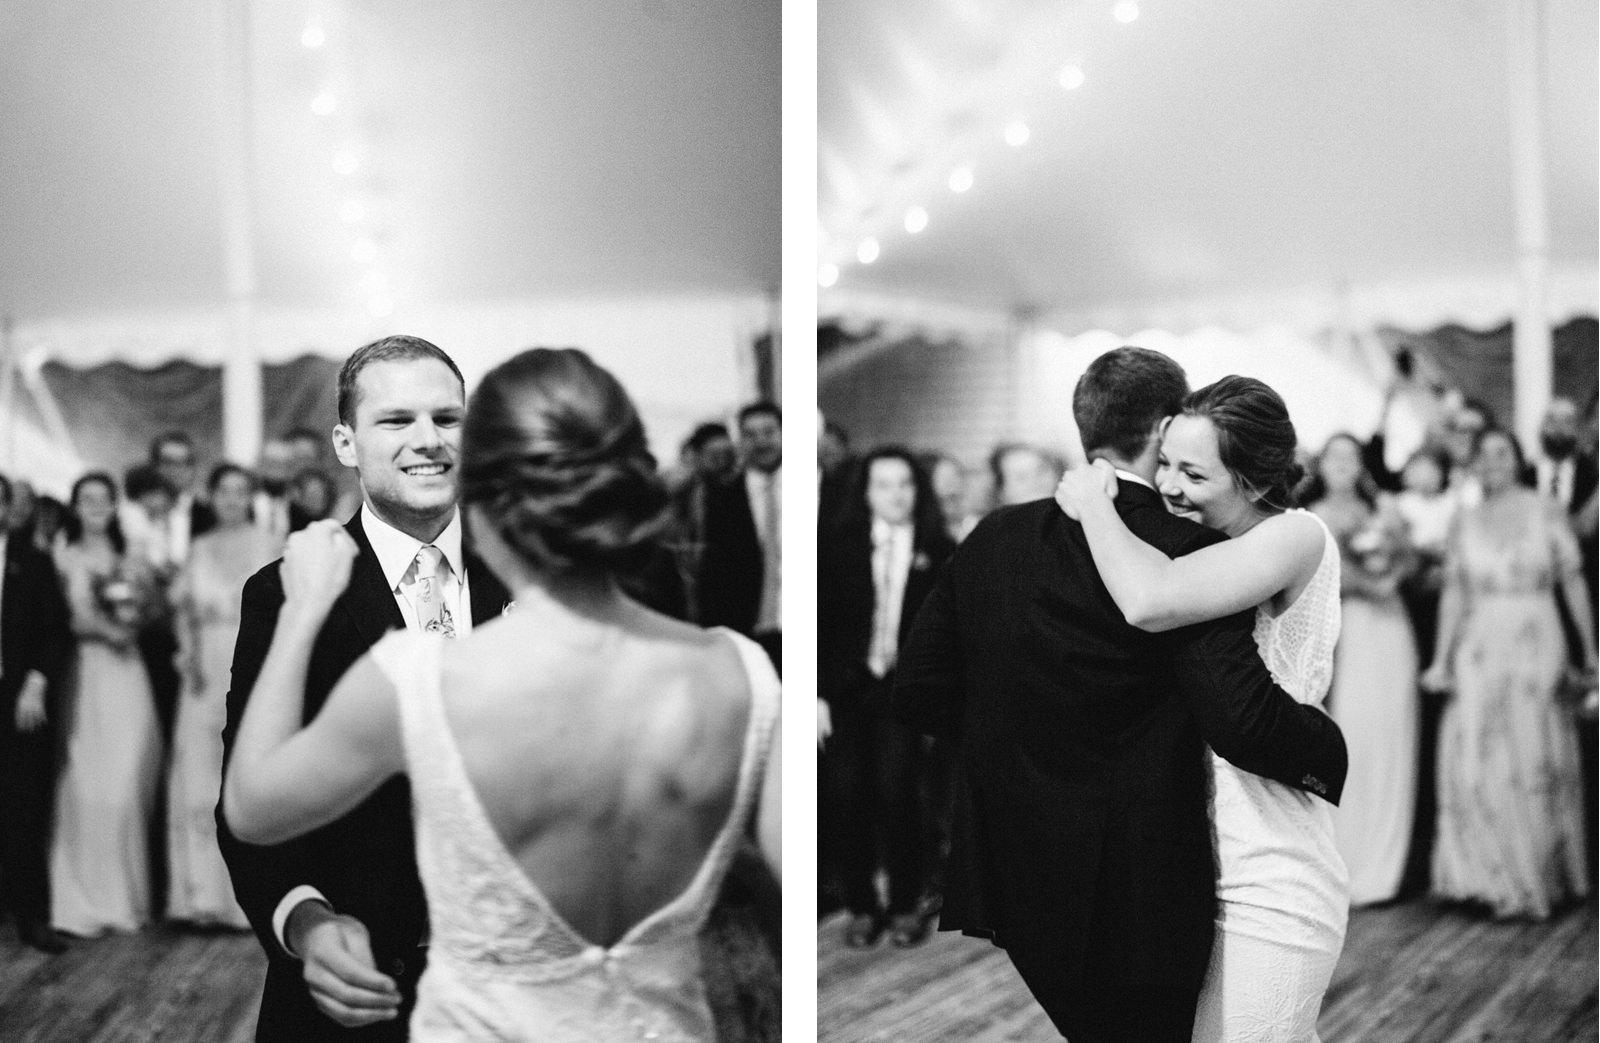 bridgeport-wedding-141 BRIDGEPORT, CONNECTICUT BACKYARD WEDDING